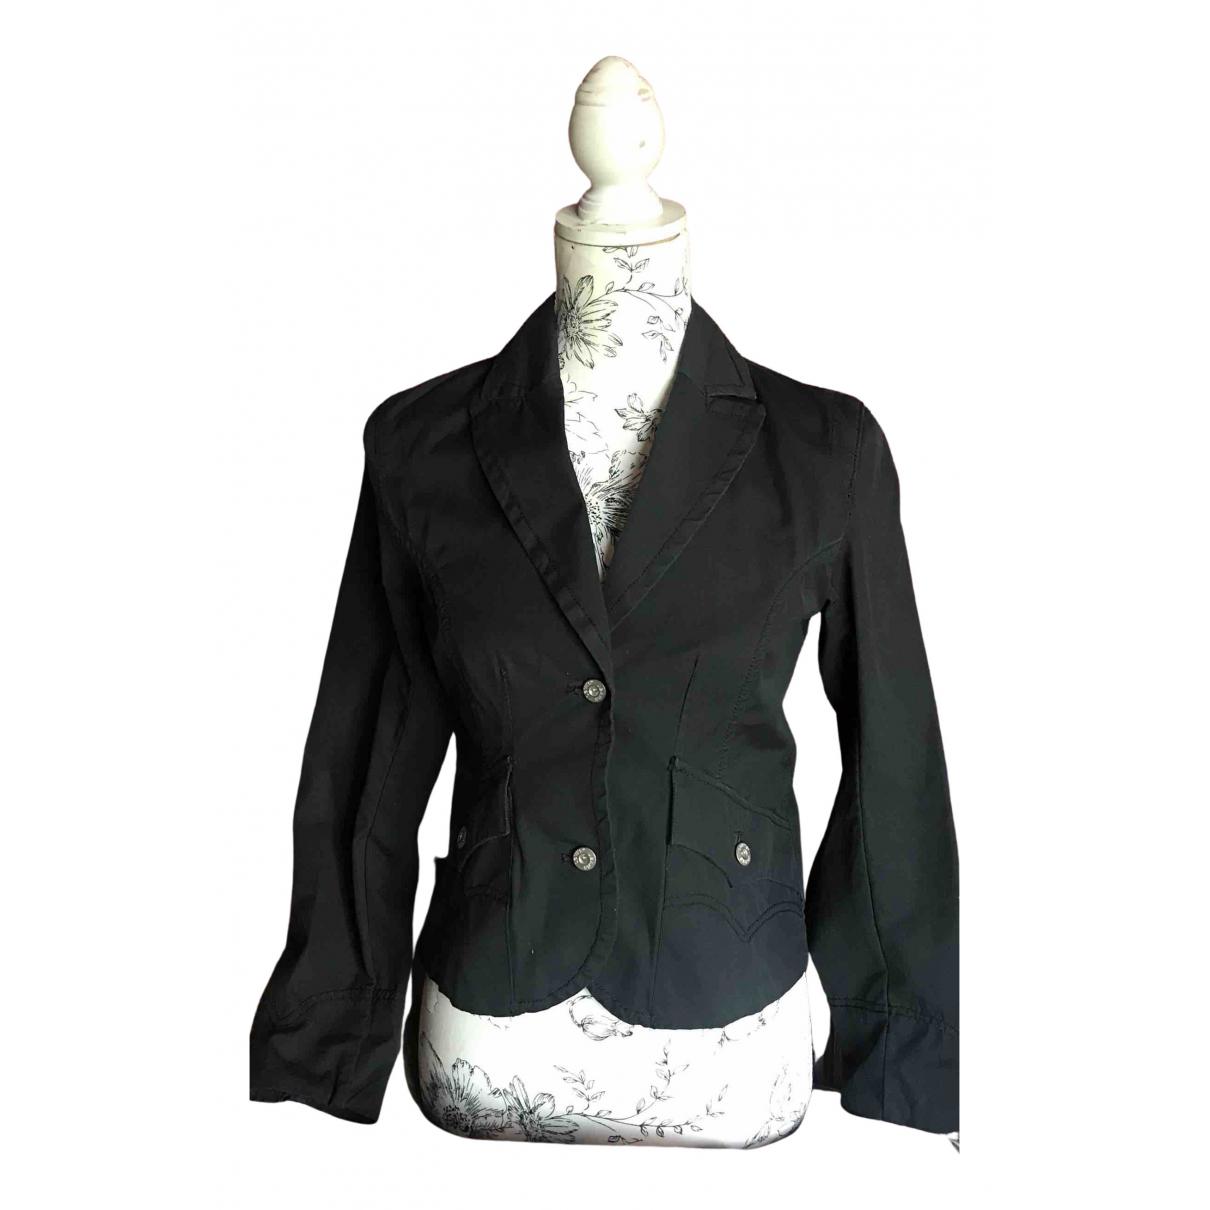 Levis N Black Cotton jacket for Women XS International